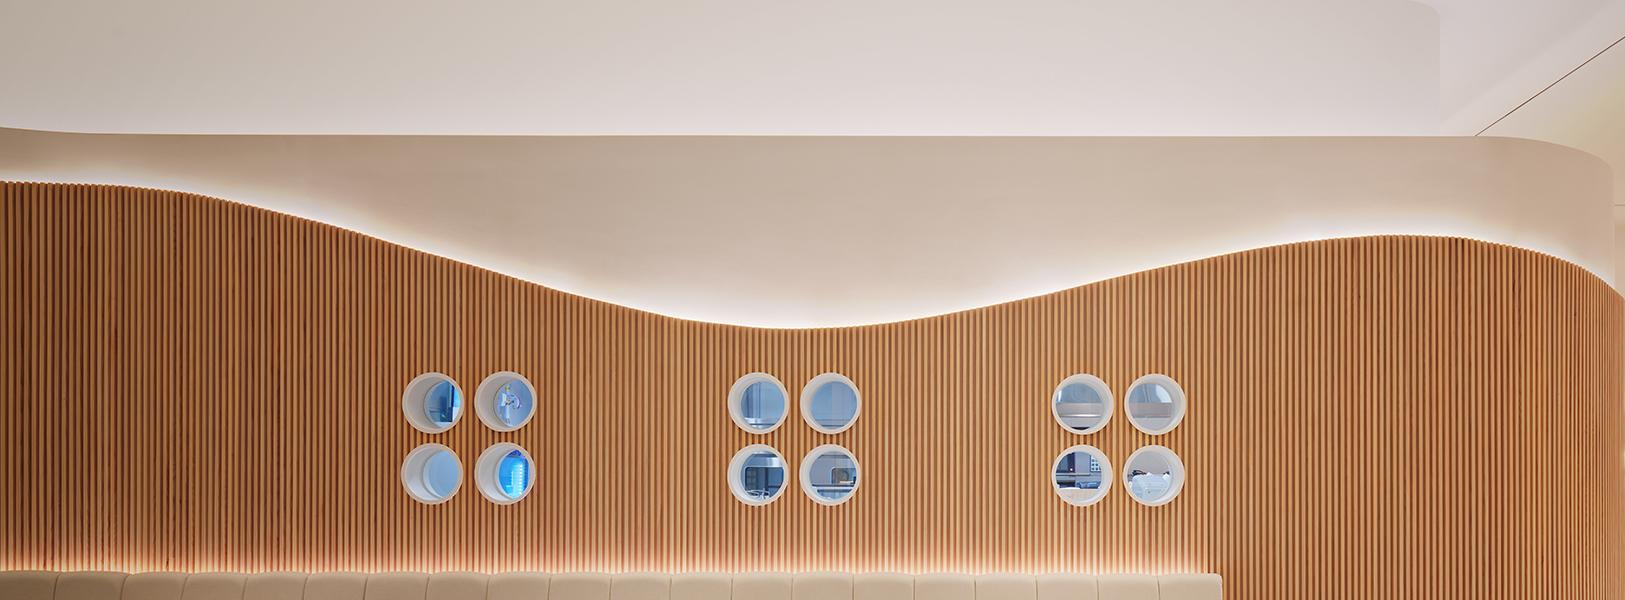 (Teo Yang Studio)Cafe Aalto by Mealdo_12_H resolution_crop.jpg